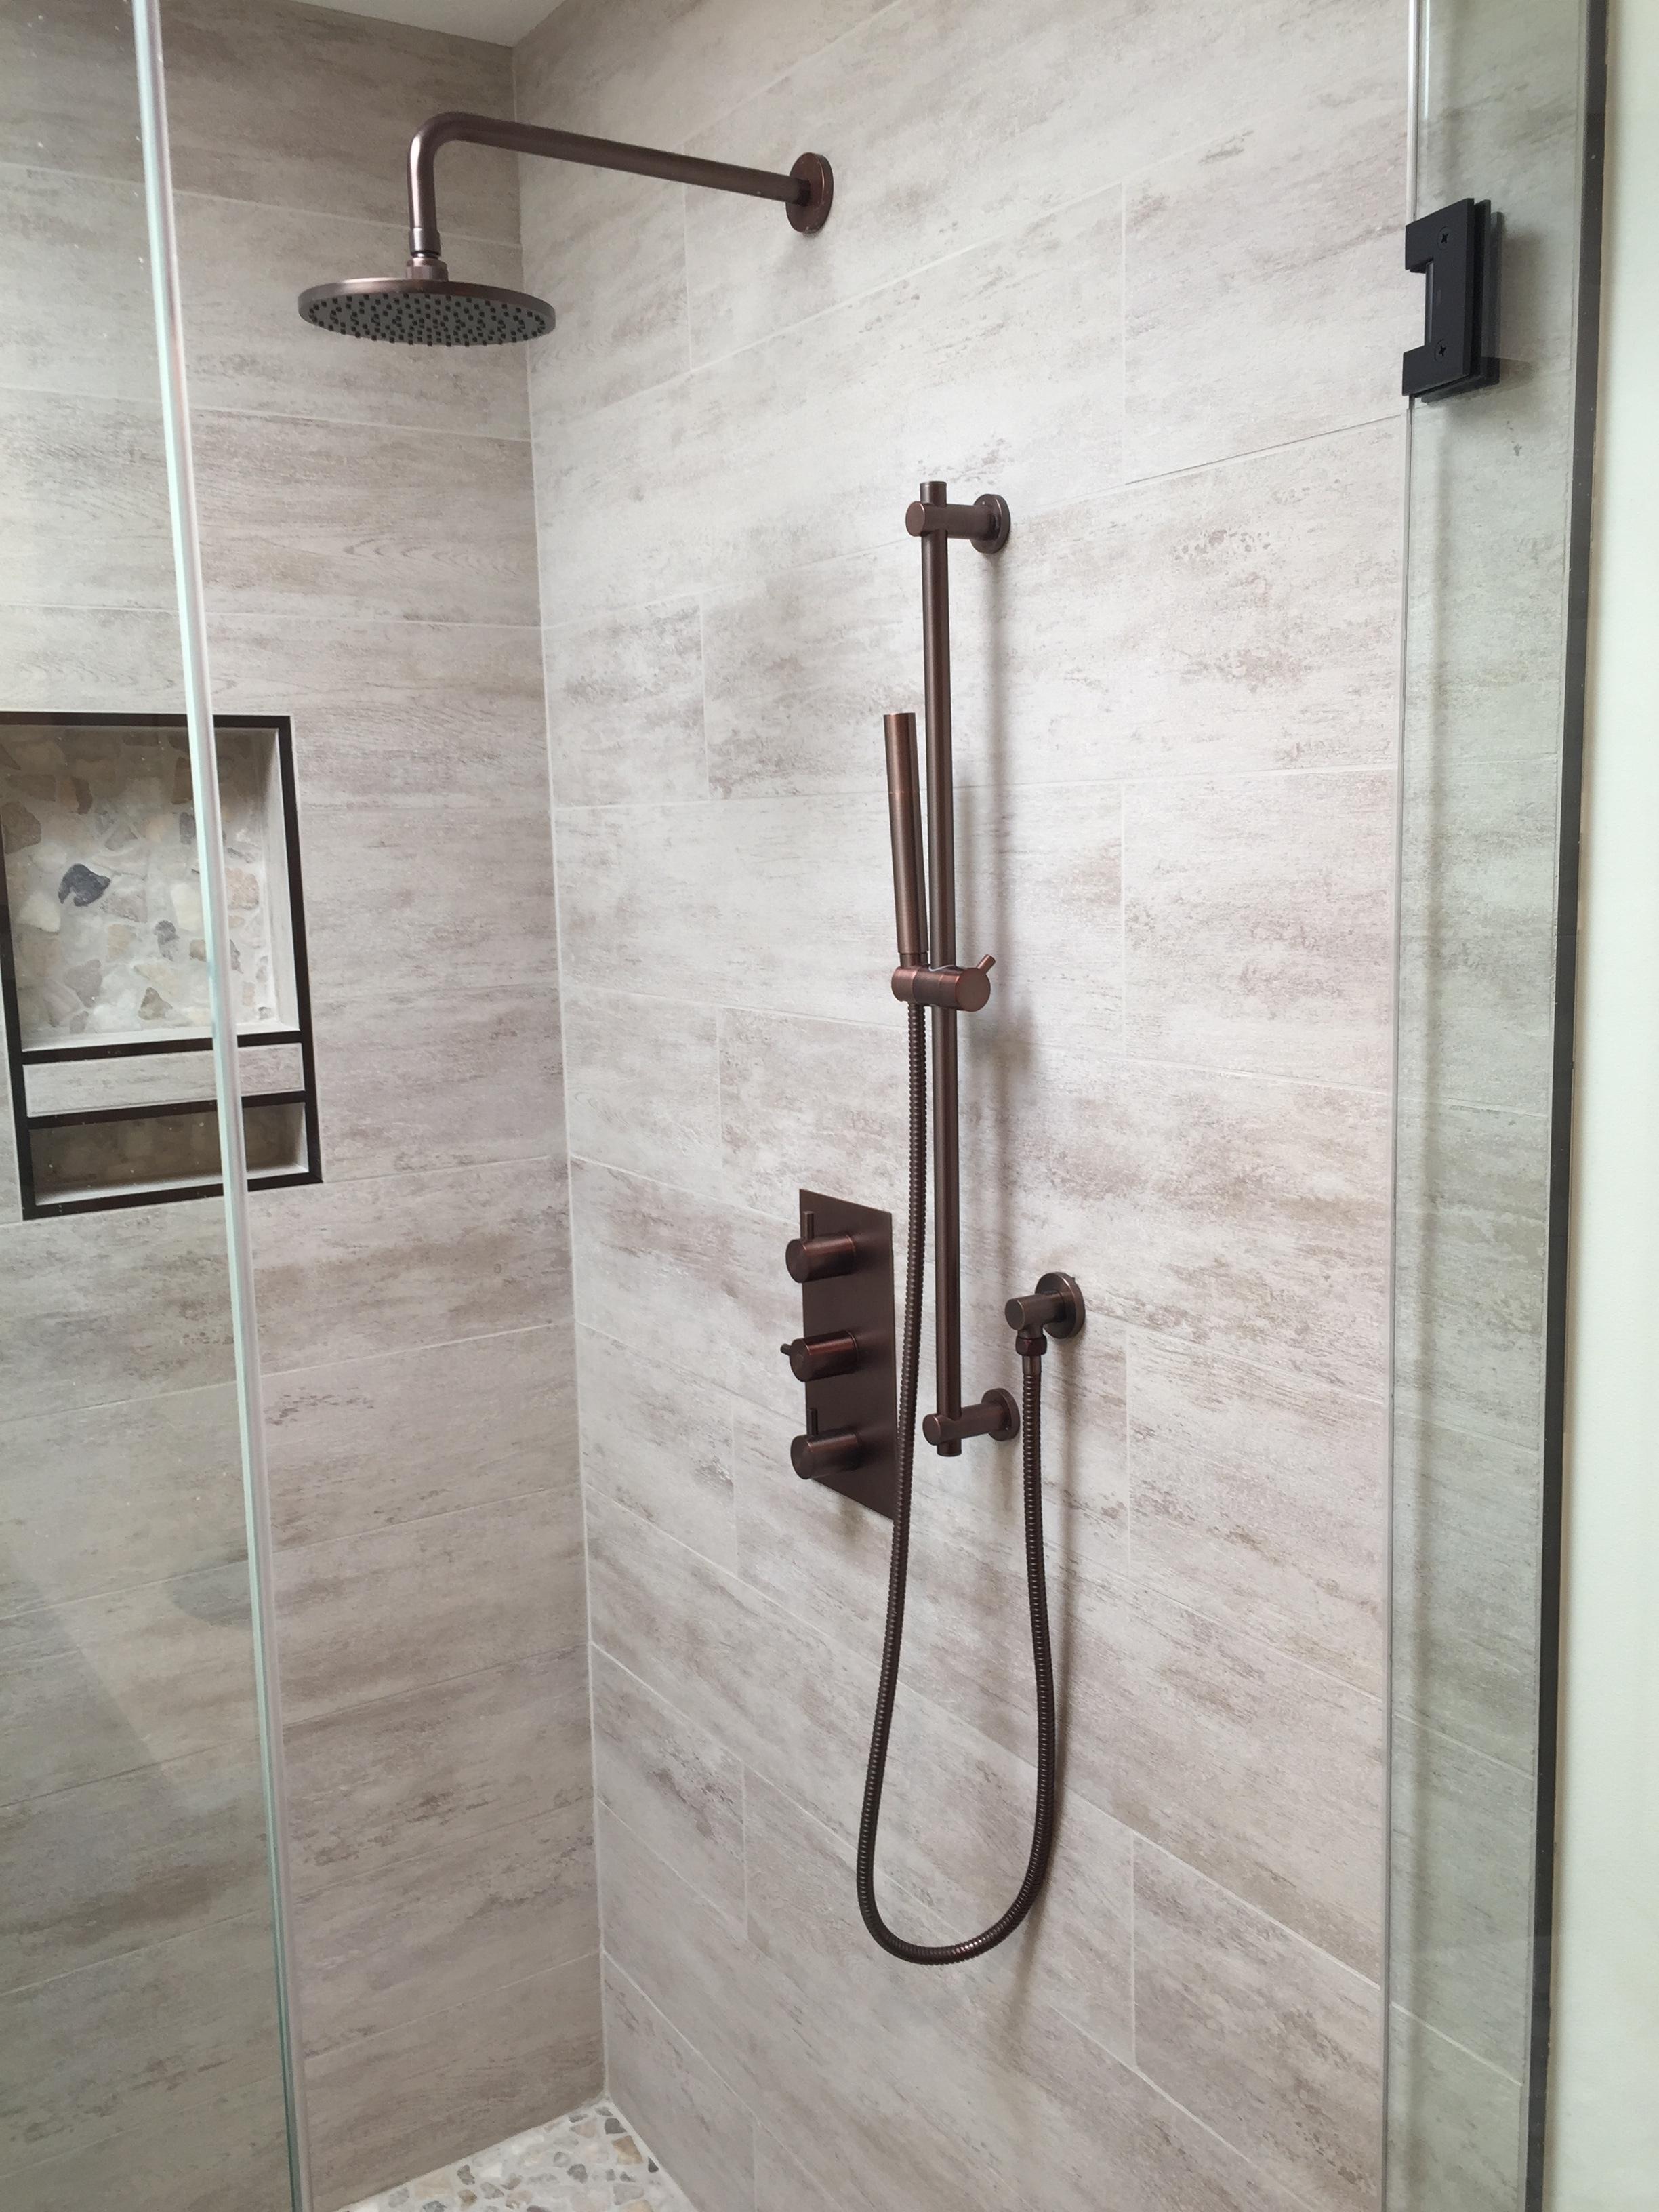 Custom shower, porcelain tile, pebble floor, recessed shower shelves, antique bronze fixtures.